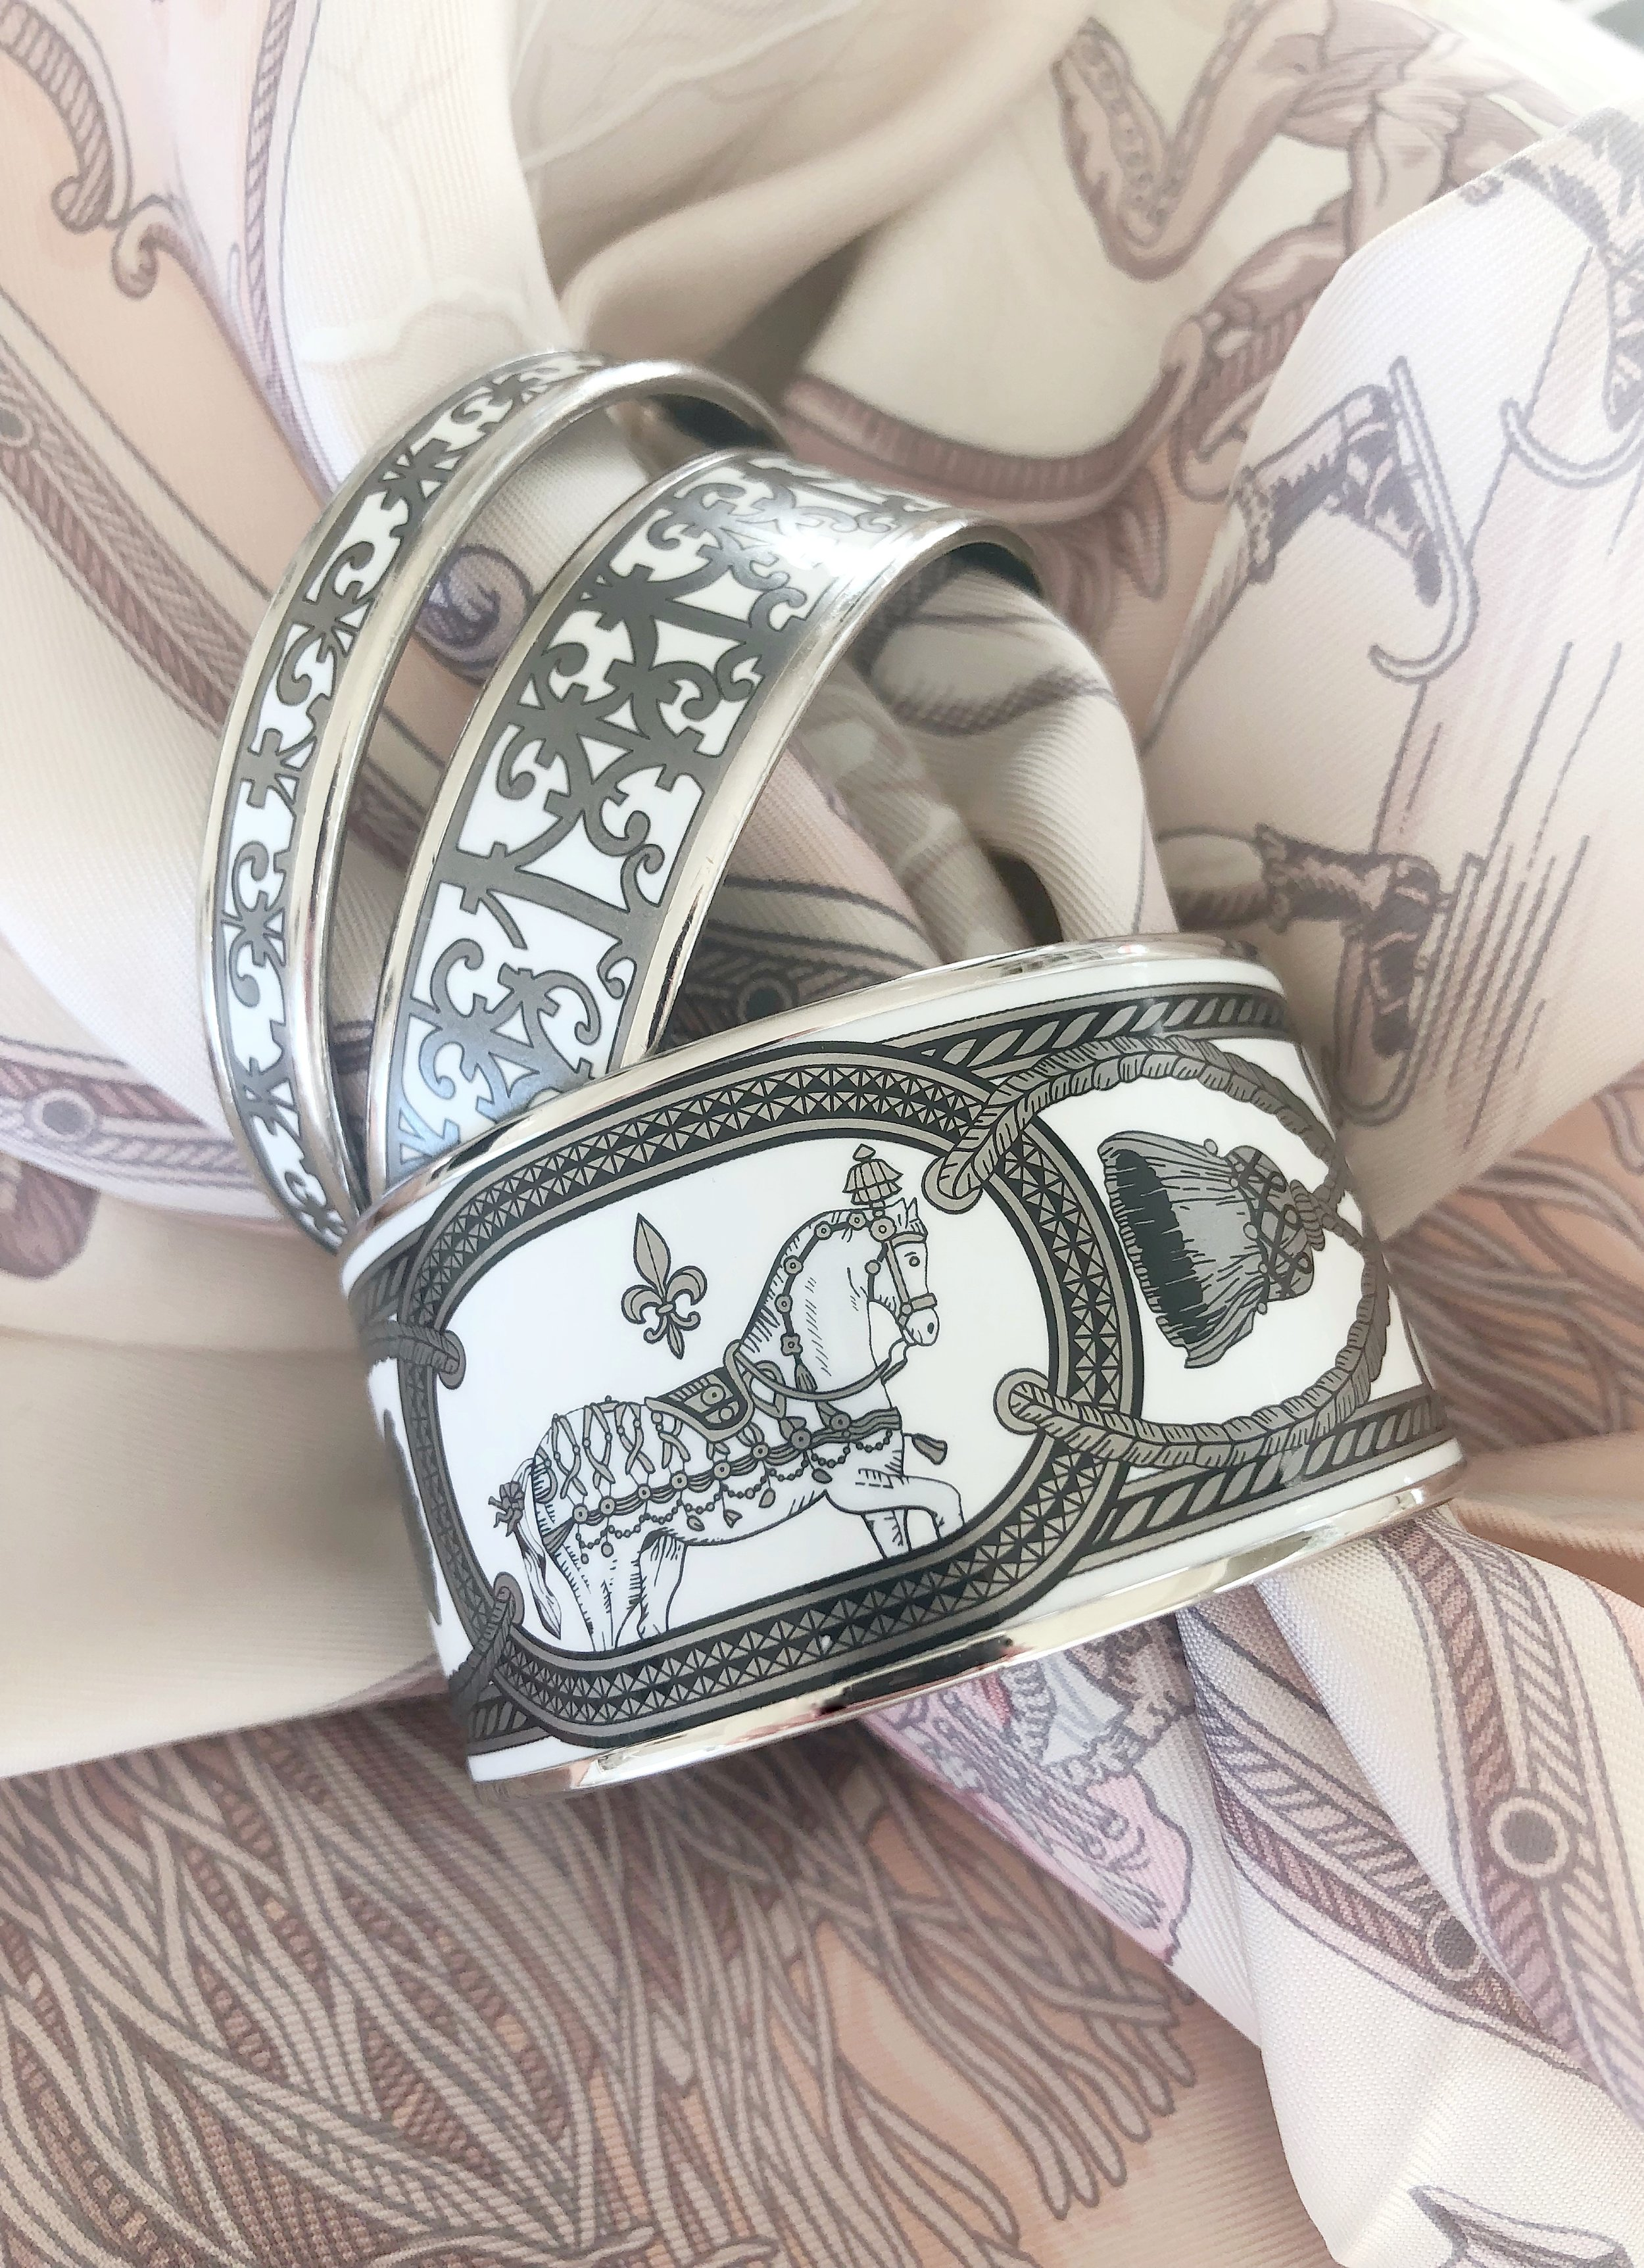 Hermes Enamel Bracelet and Hermes Pink Scarf